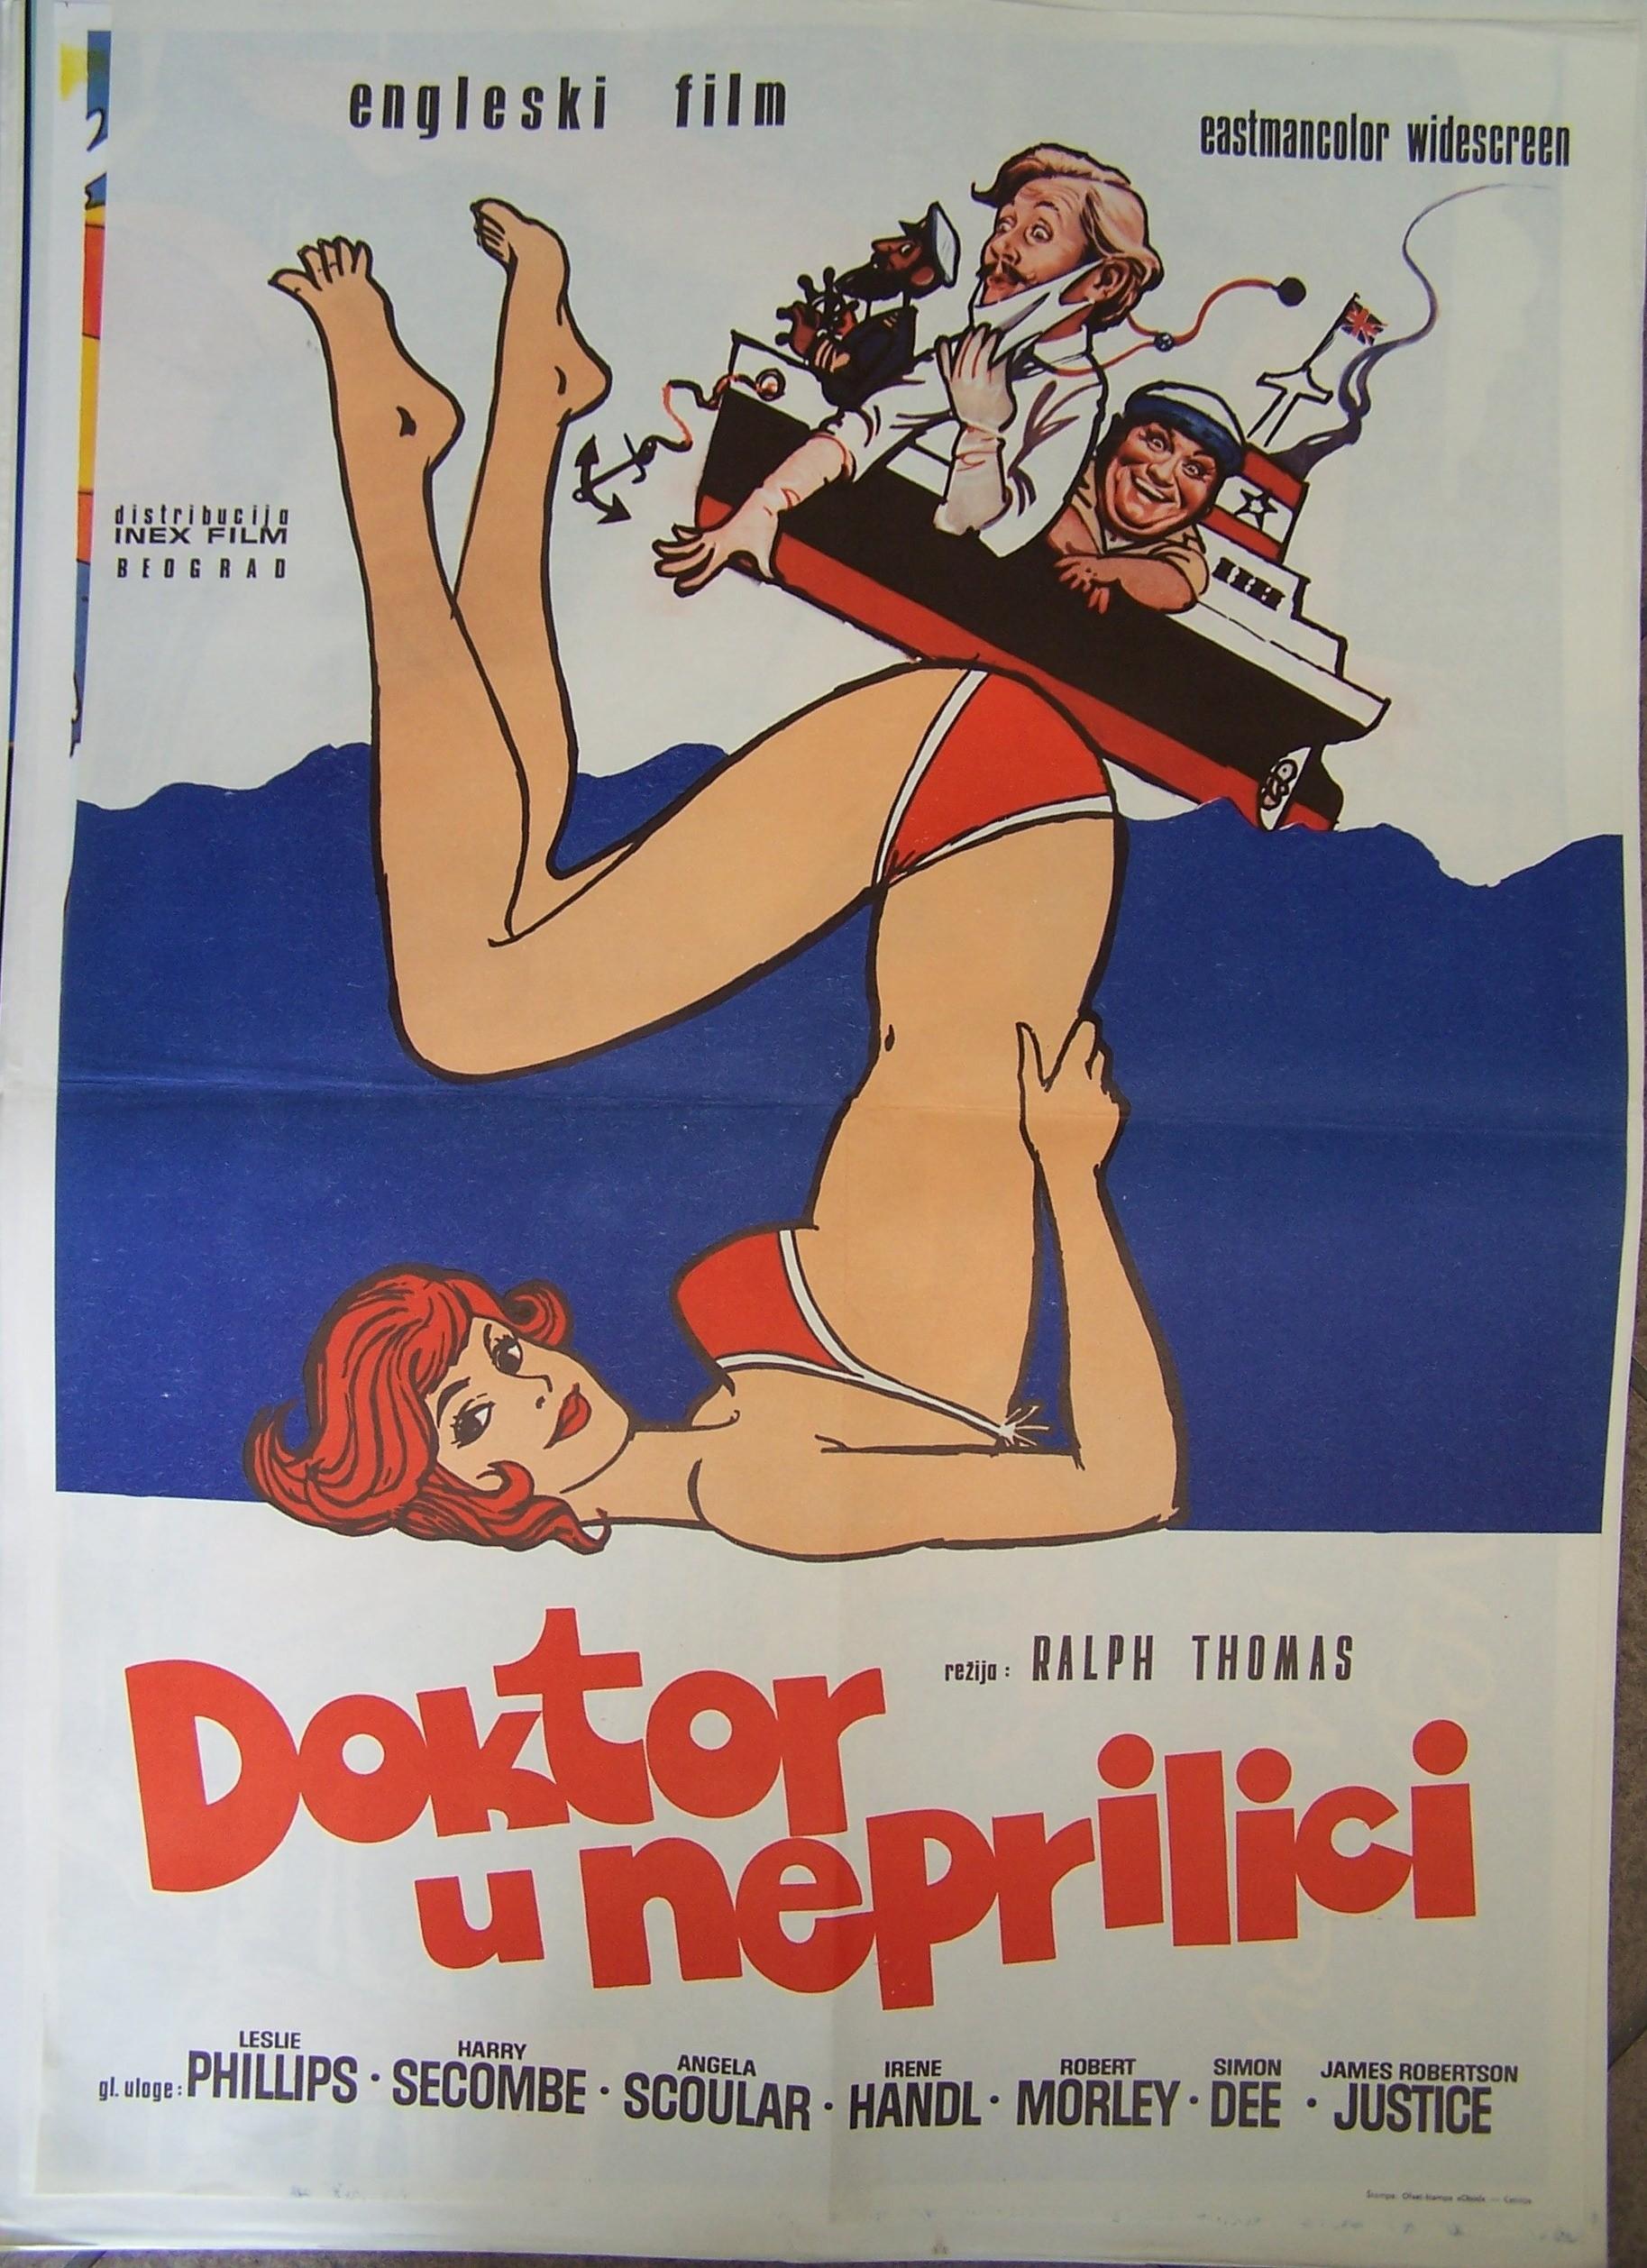 Doktor U Neprilici